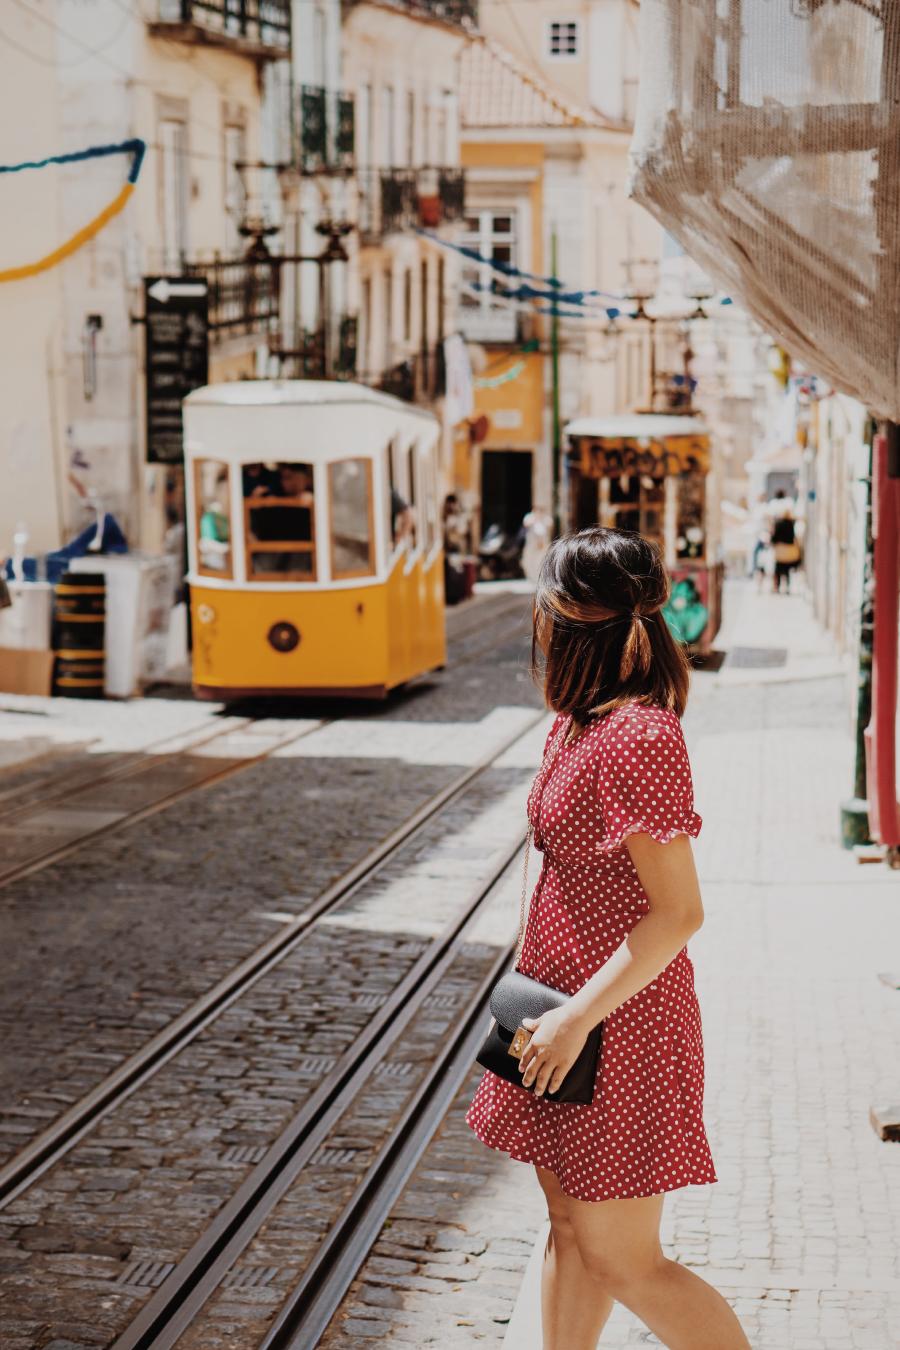 lisabon top 10 znamenitosti grada